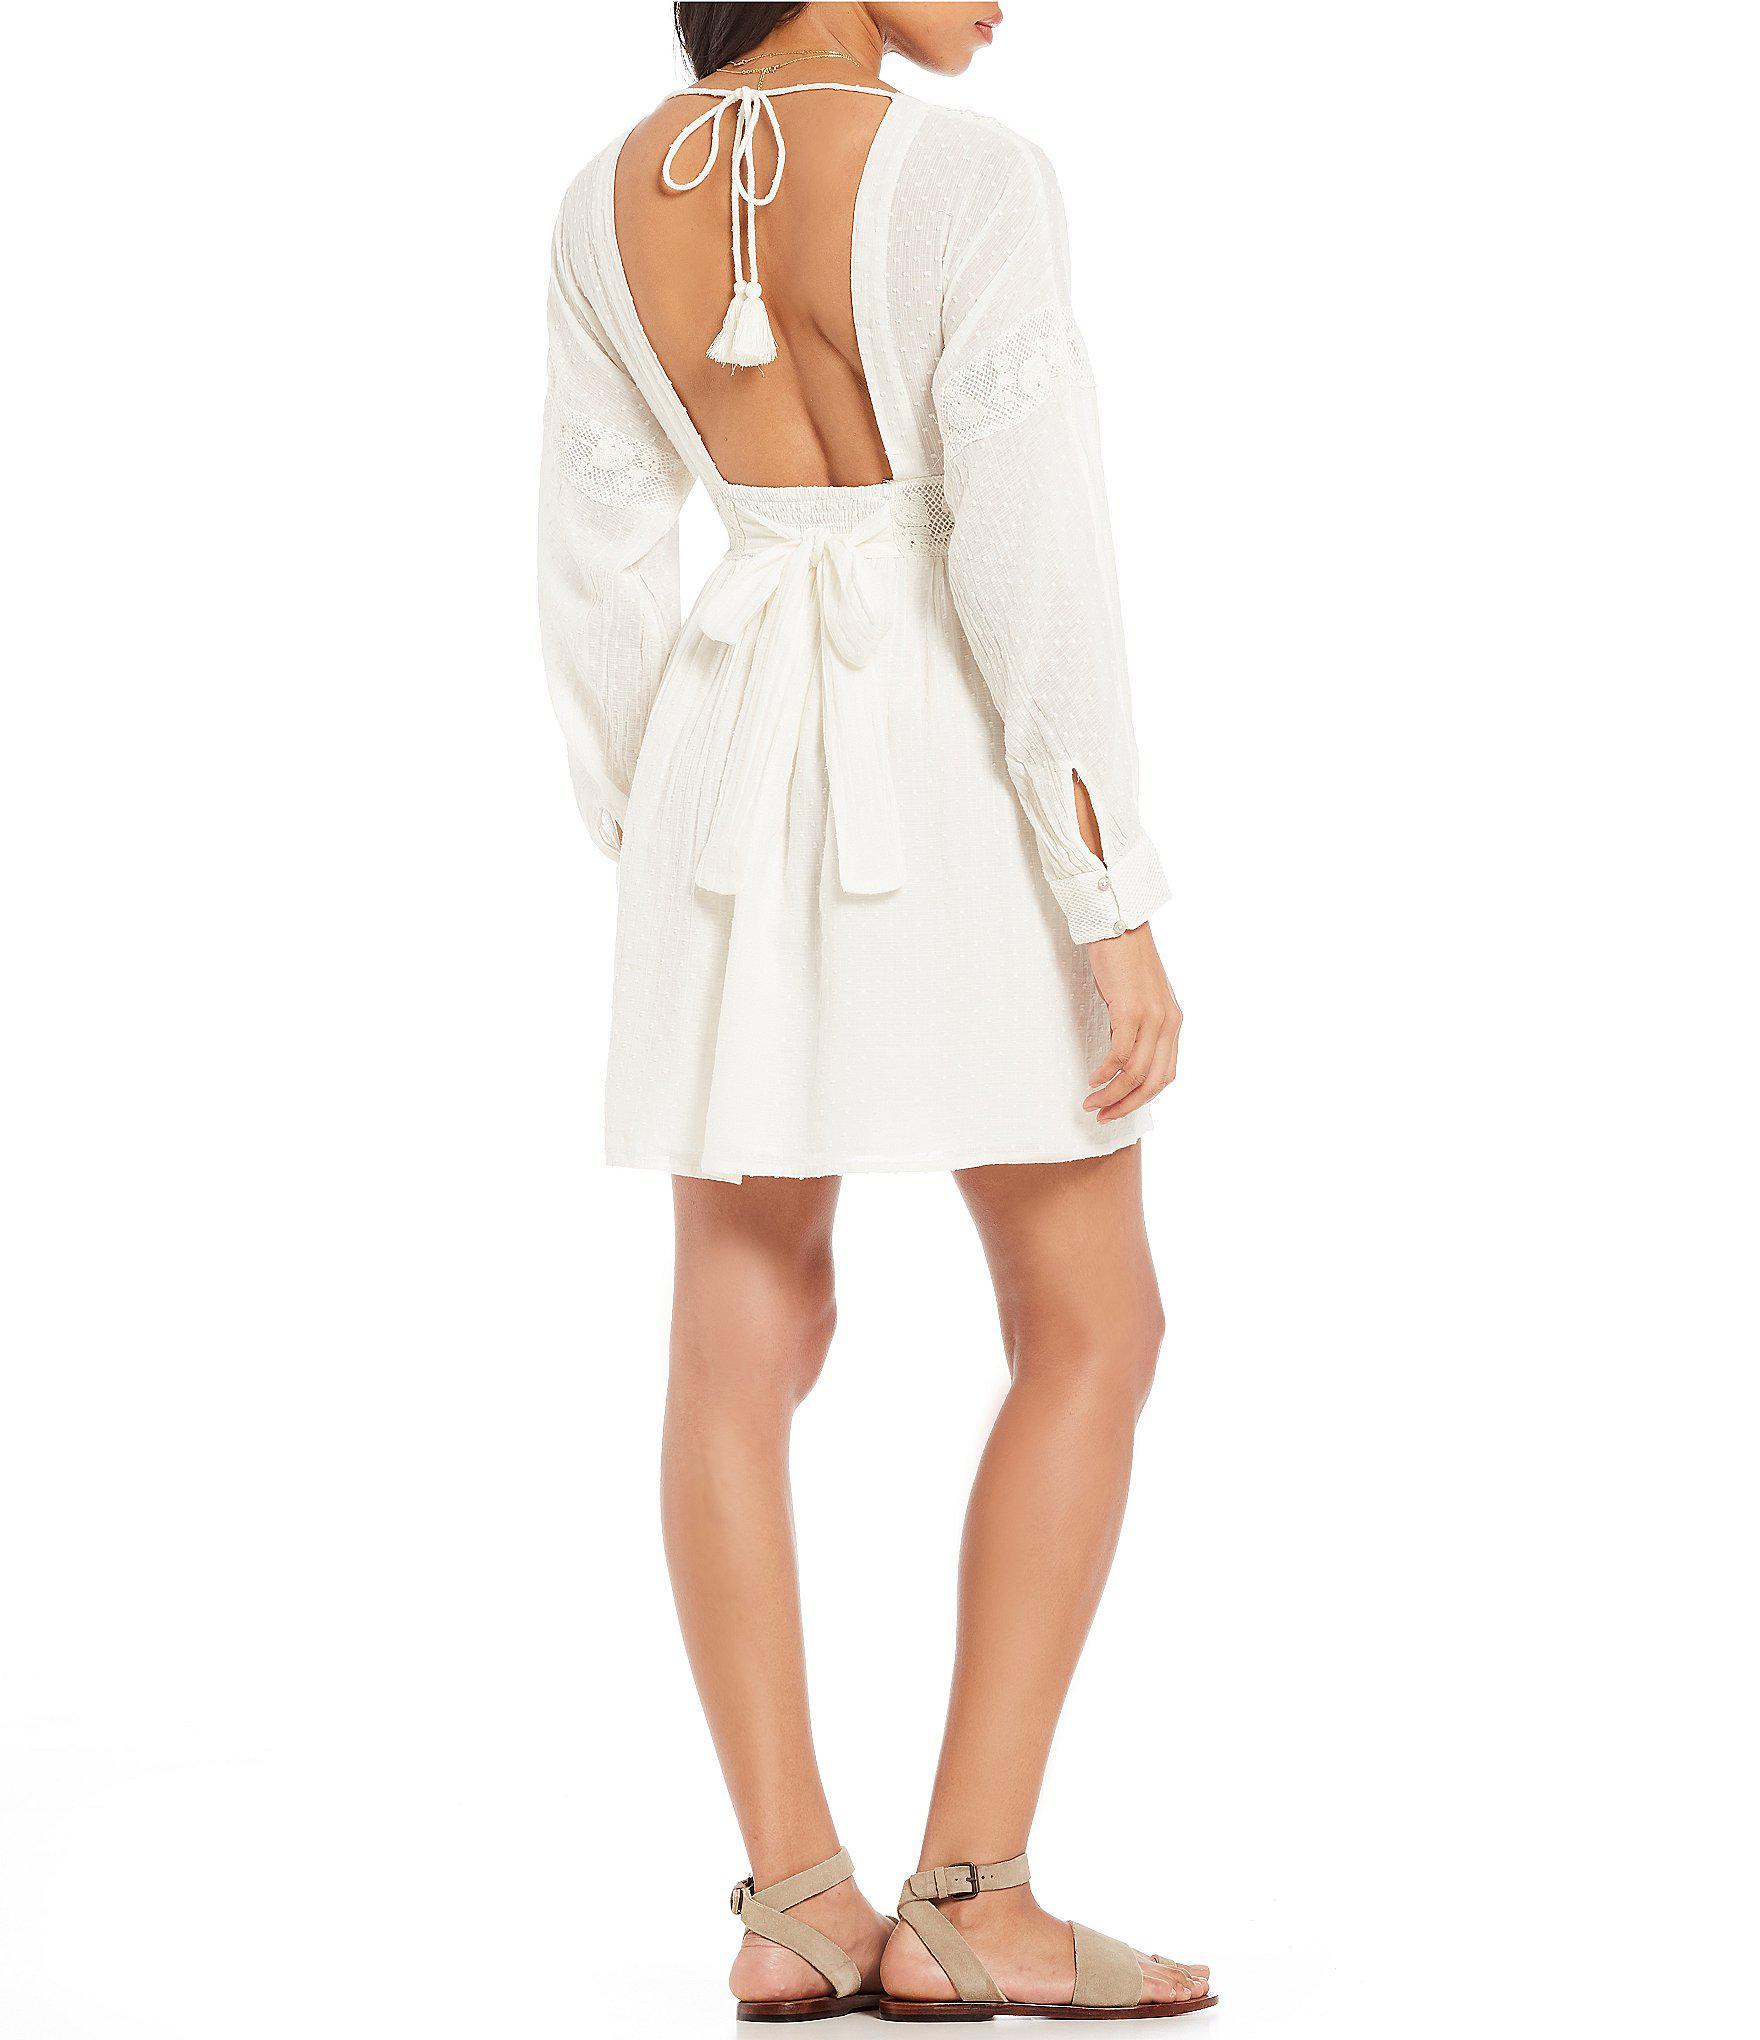 1aca2342dd8 Free People Sugarpie Embroidered Prairie Mini Dress in White - Lyst